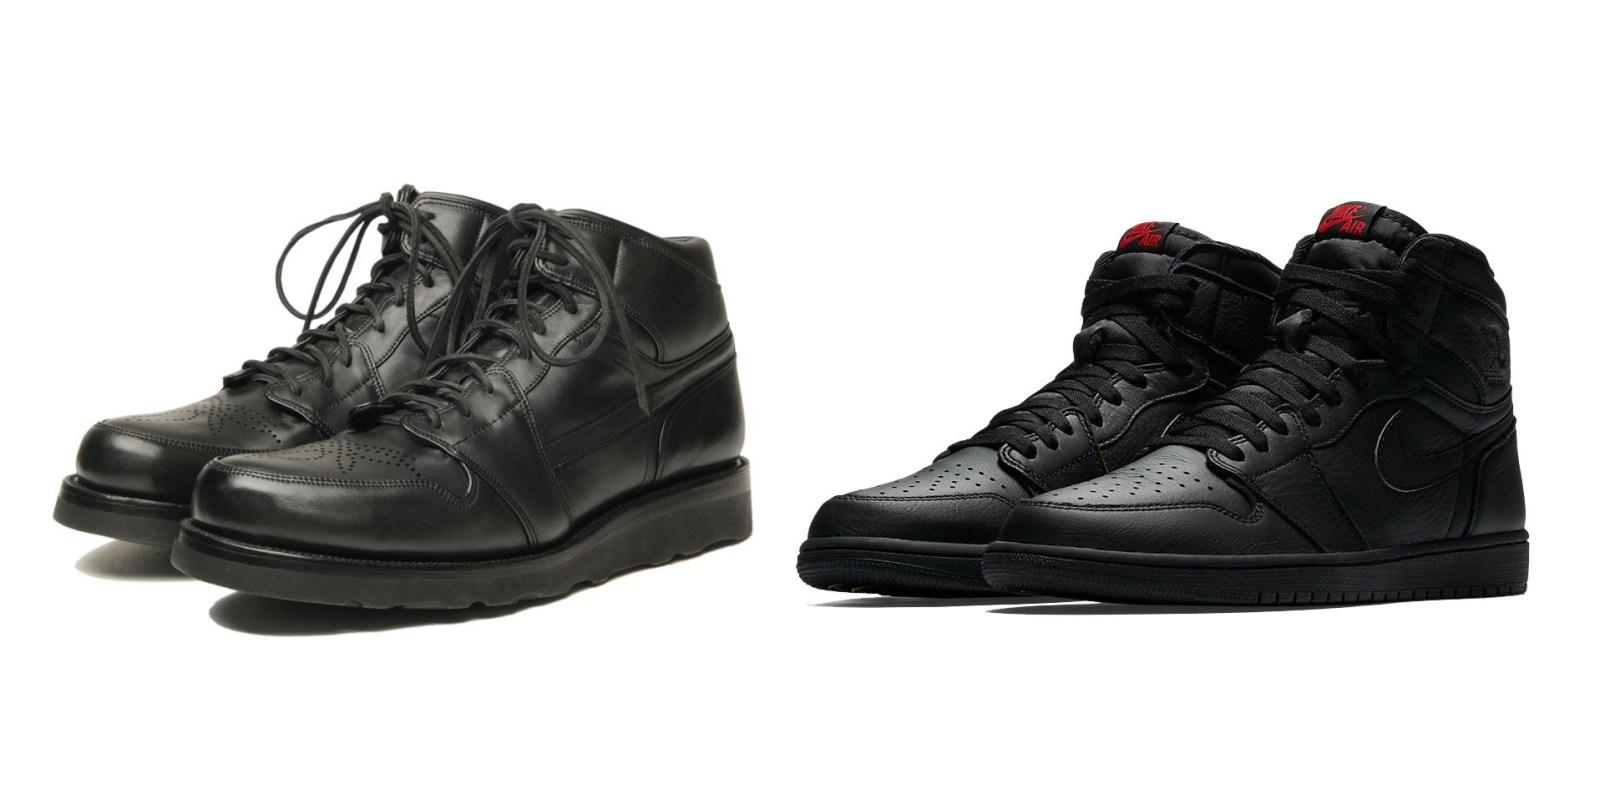 Yuketen 以 Air Jordan 1 為靈感打造全新「Land Jordan First」靴款